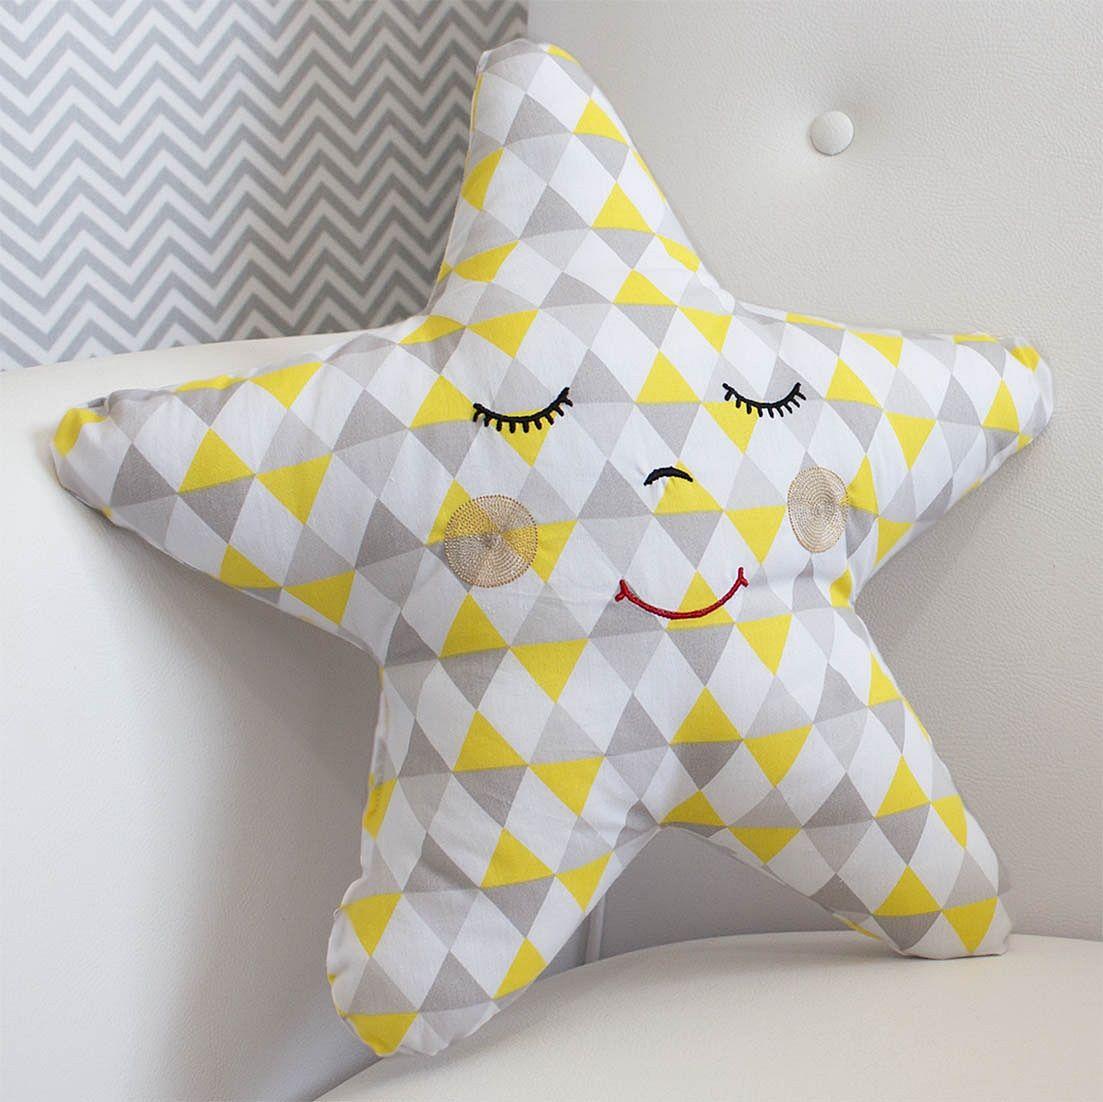 Almofada Estrela Losango Amarelo